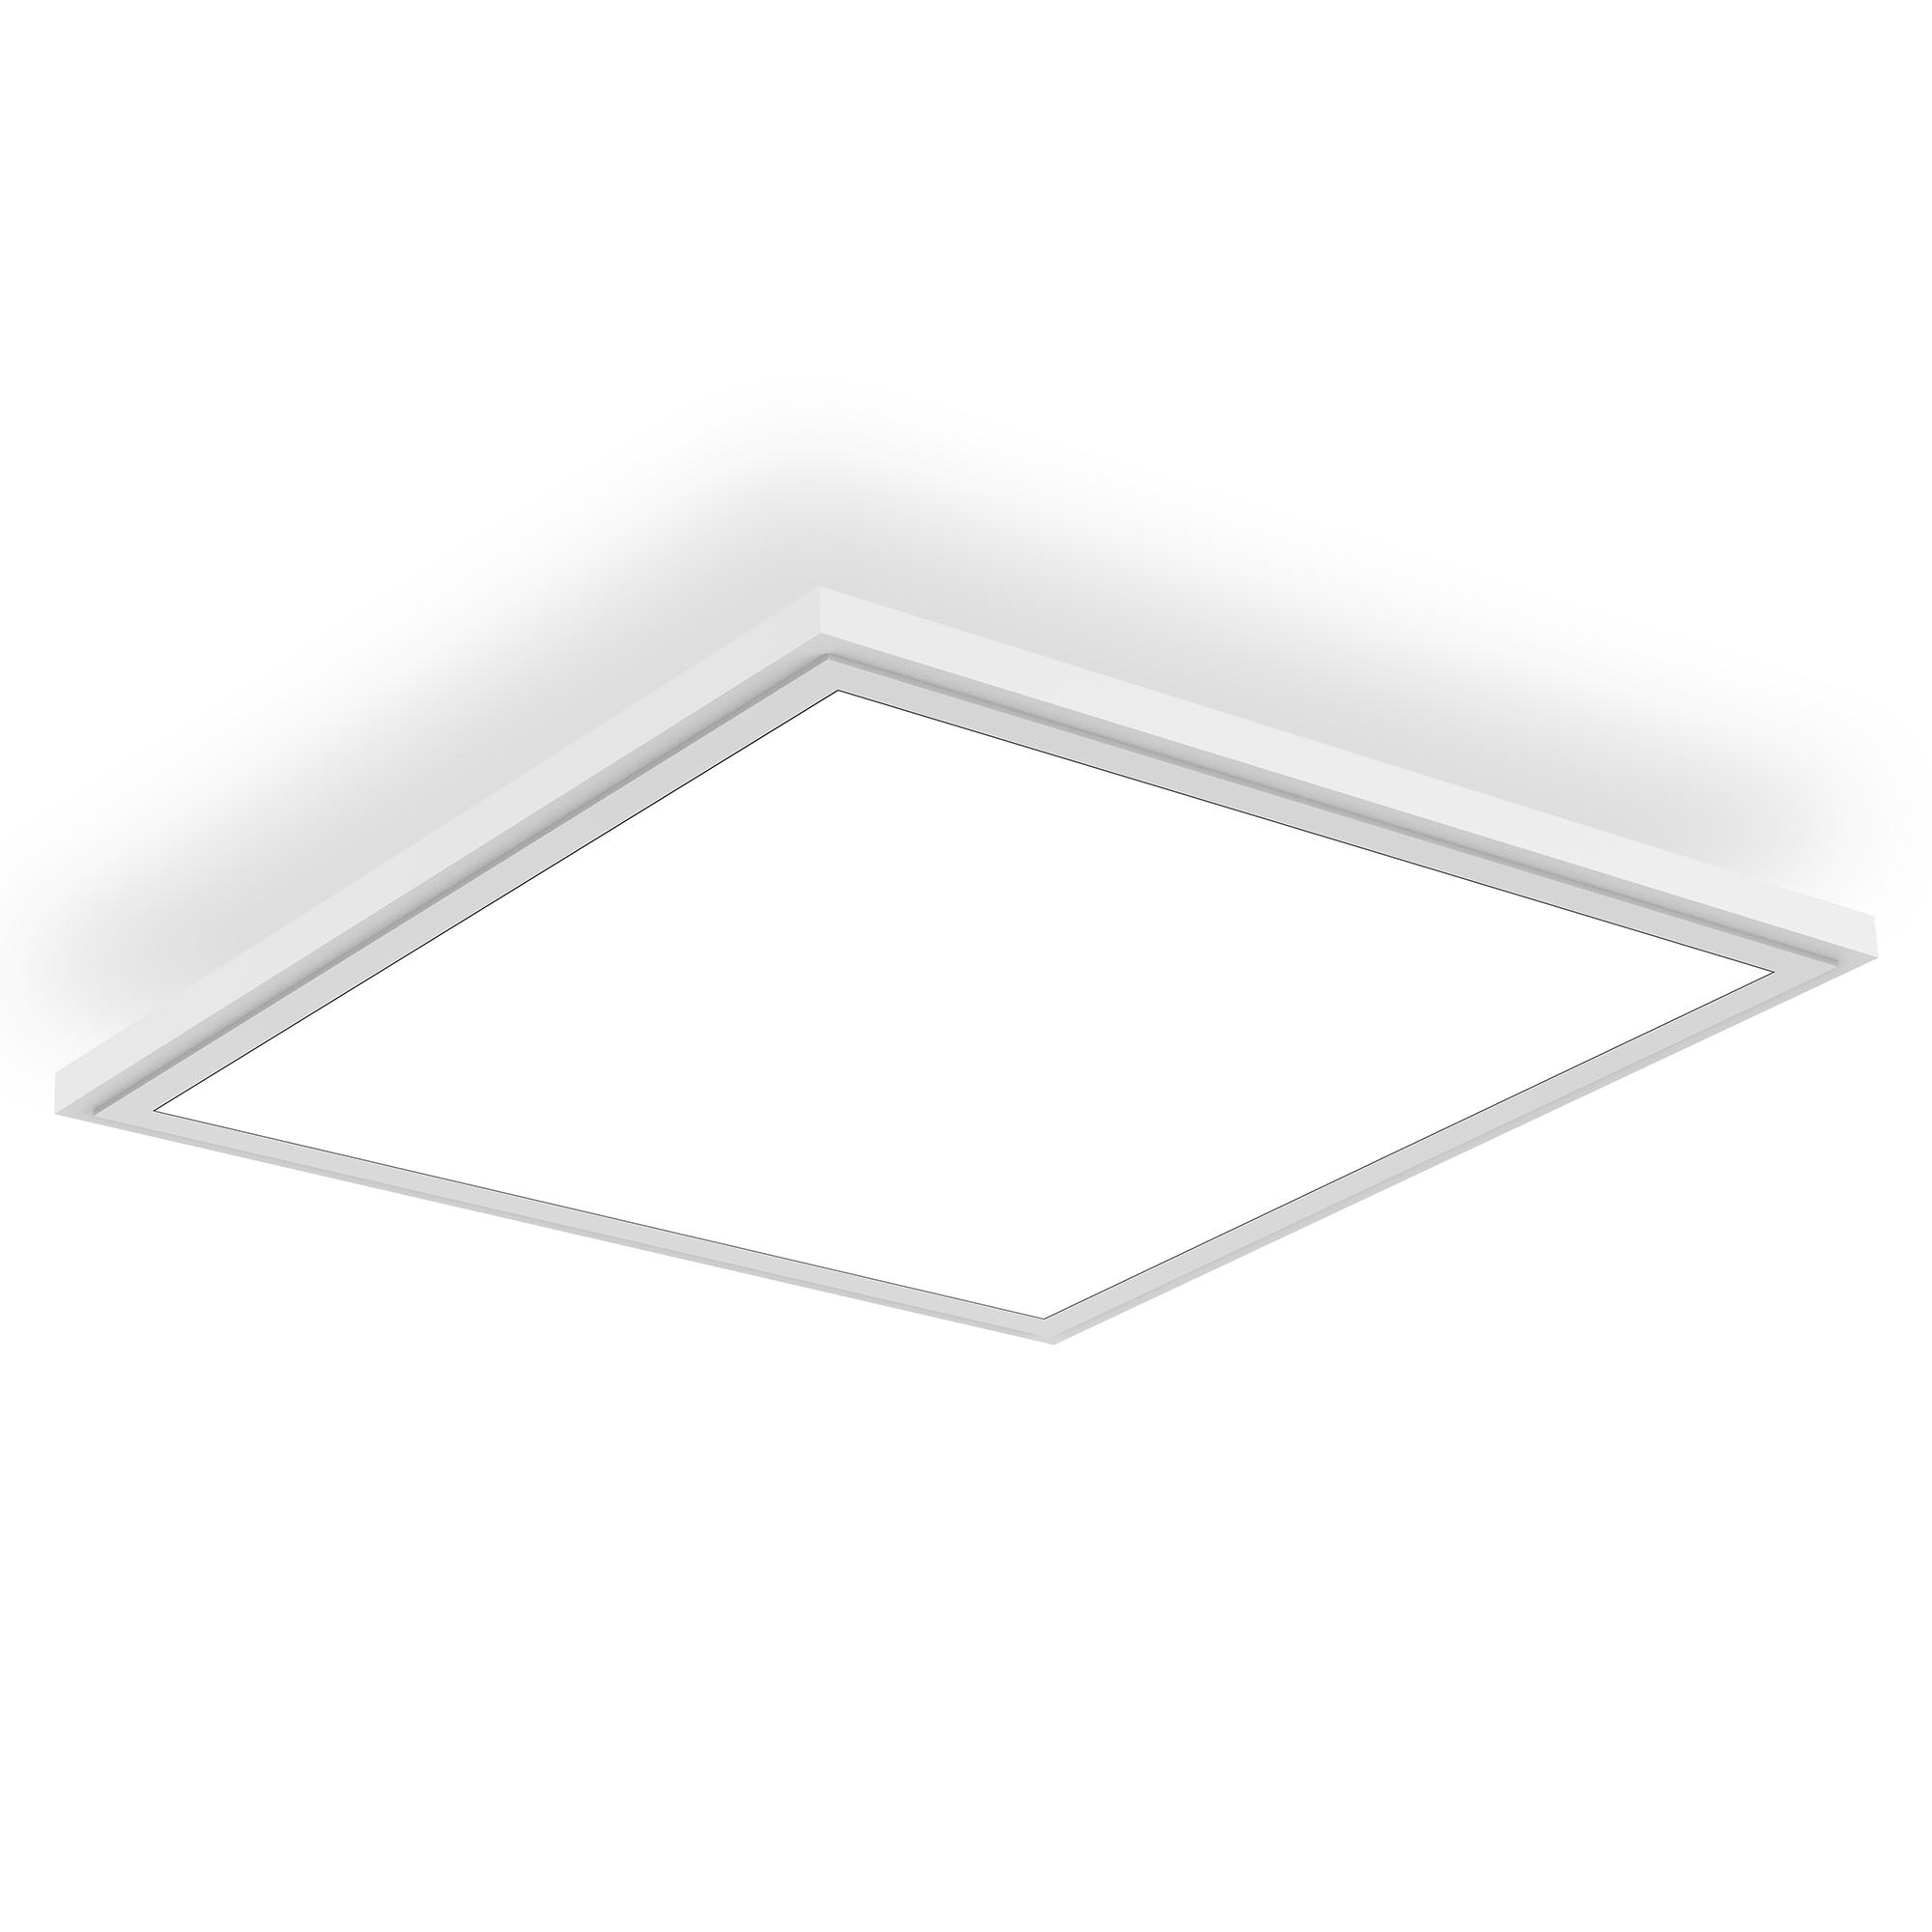 LED Panel, 45 cm, 2200 LUMEN, 22 WATT, Weiß